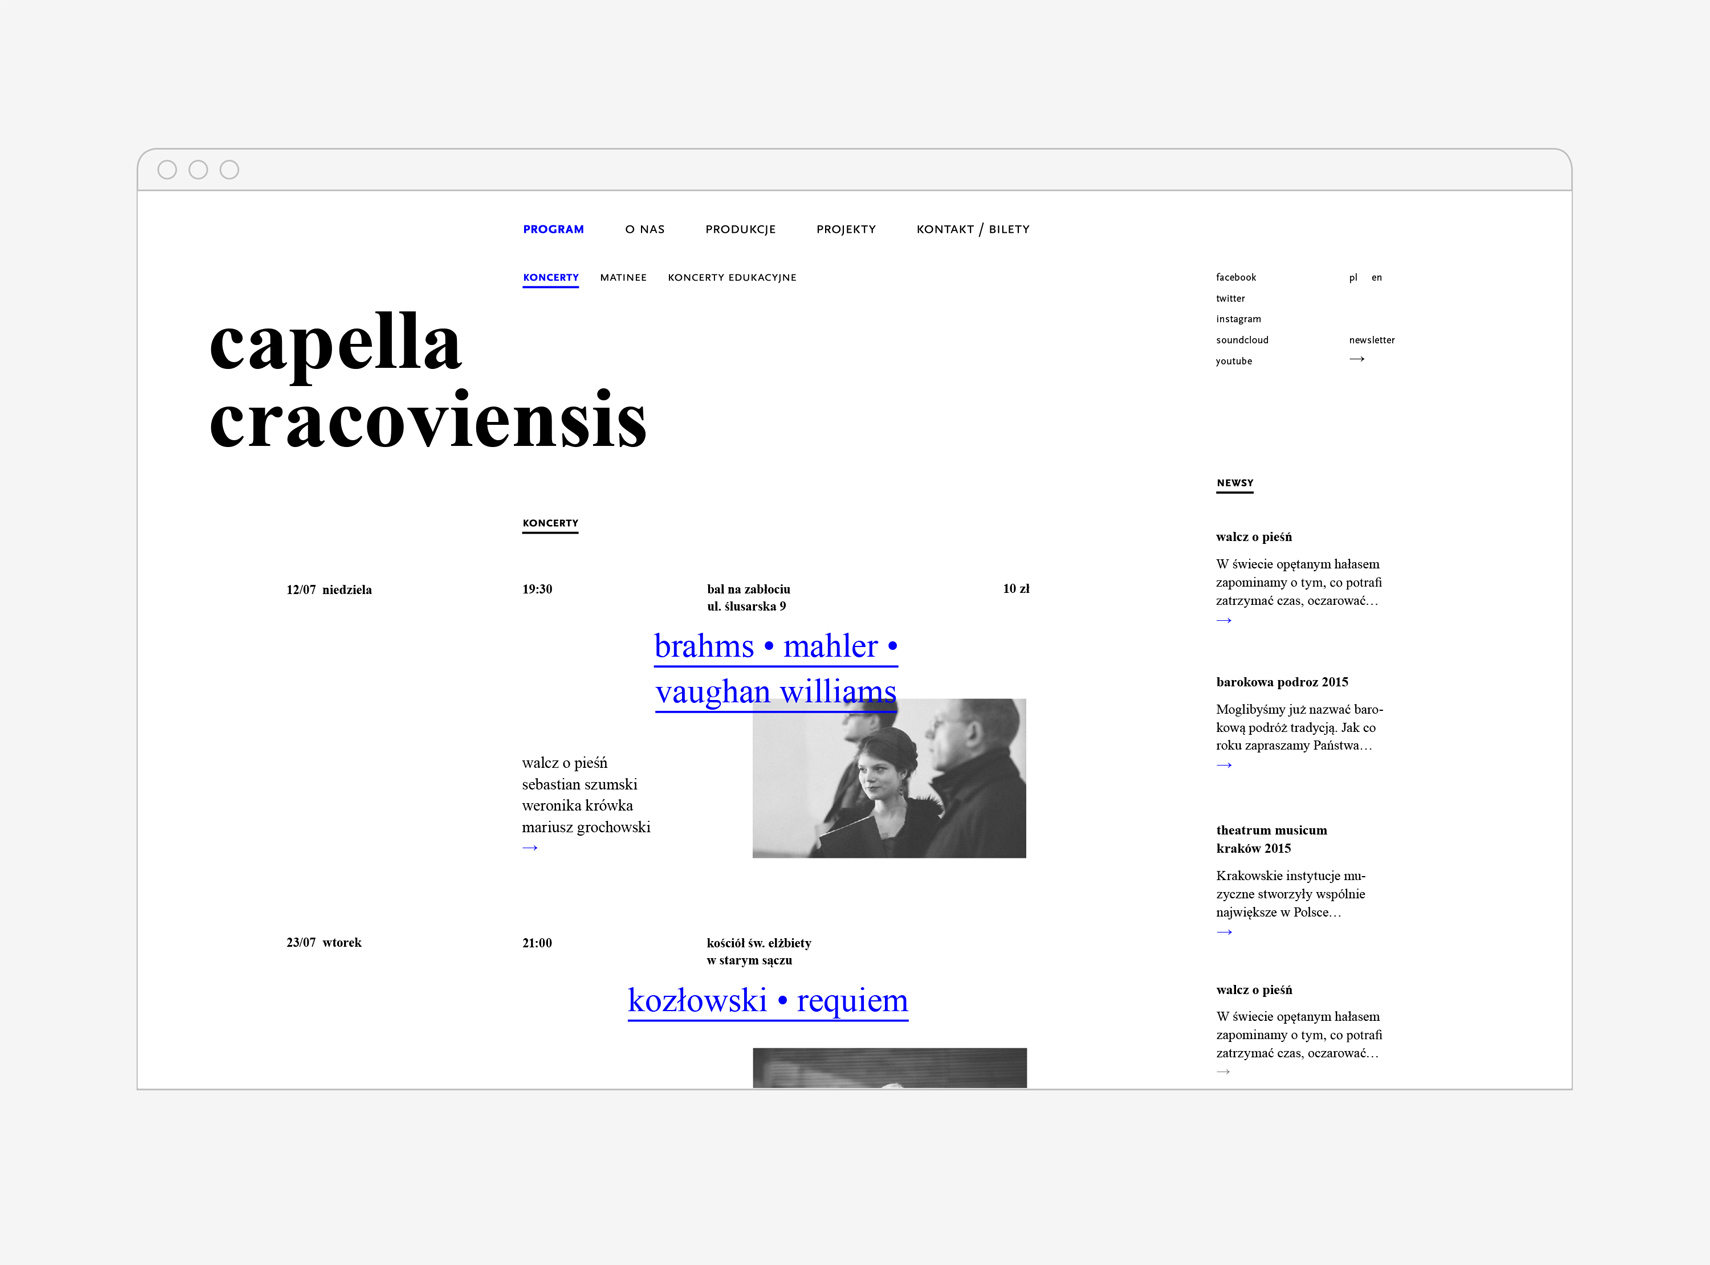 Capella Cracoviensis